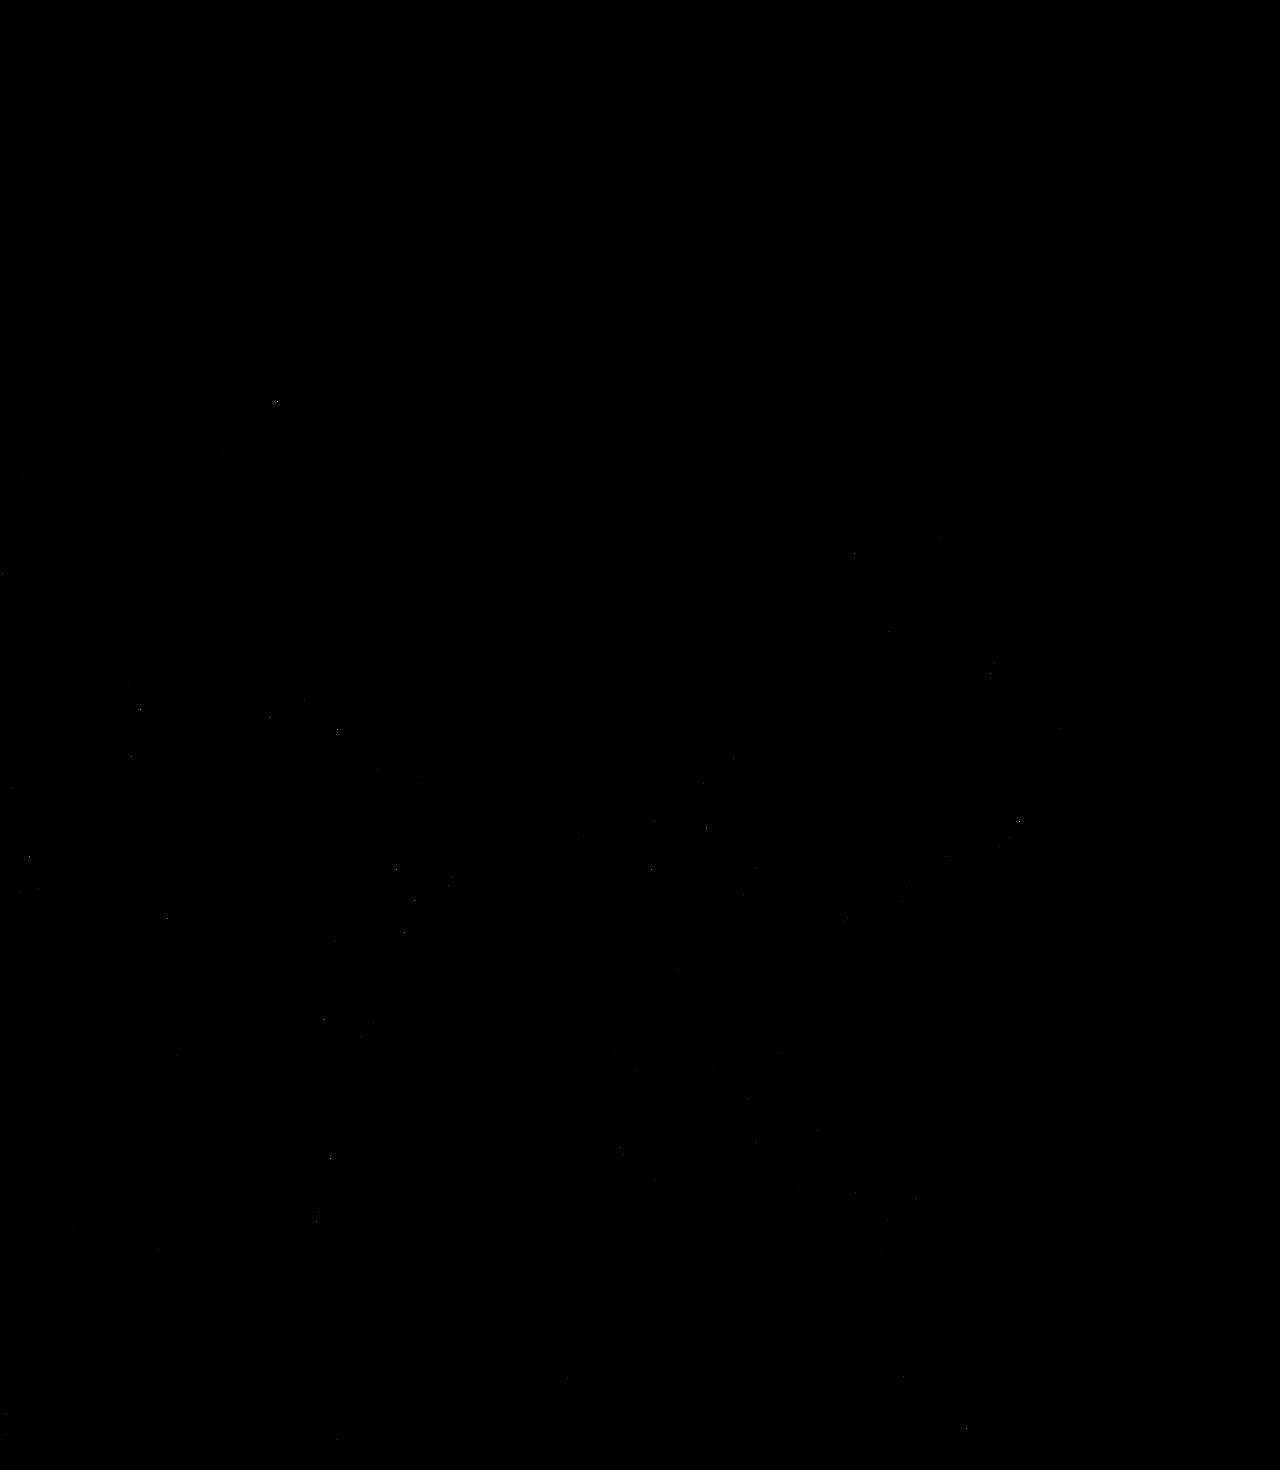 Naruto Lineart : Sasuke and naruto lineart by cheeryy on deviantart